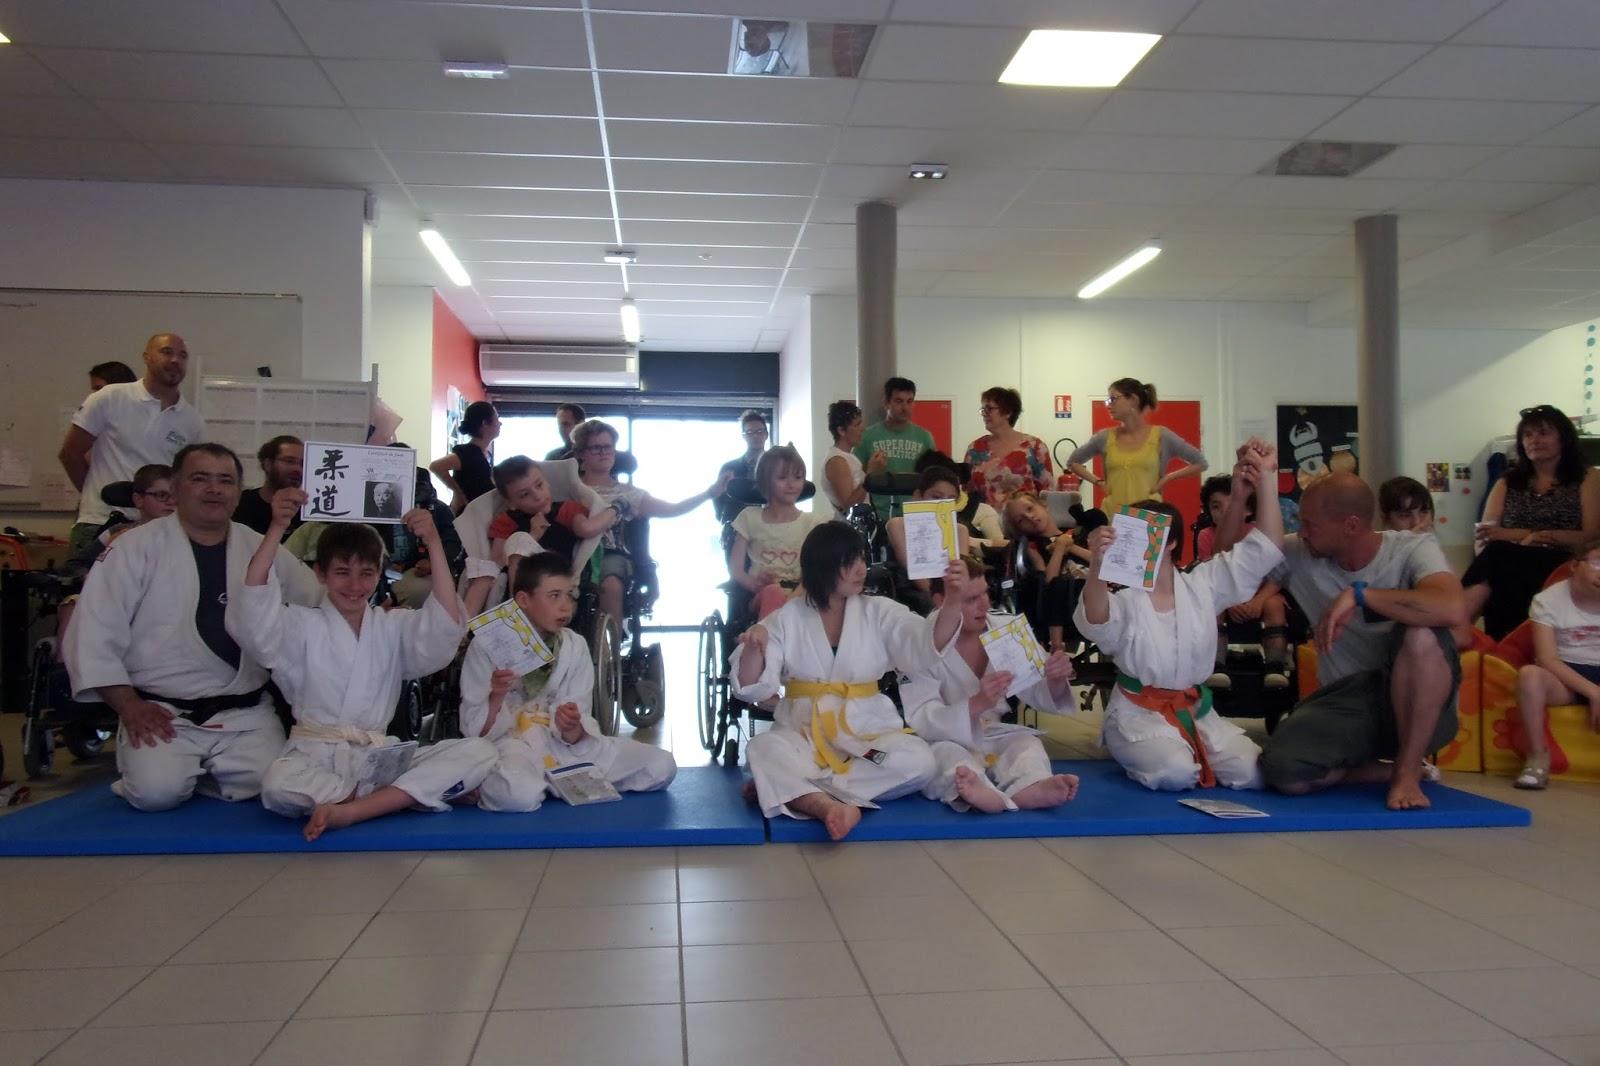 Grand couronne judo mardi 30 juin 2015 for Foyer colette yver rouen